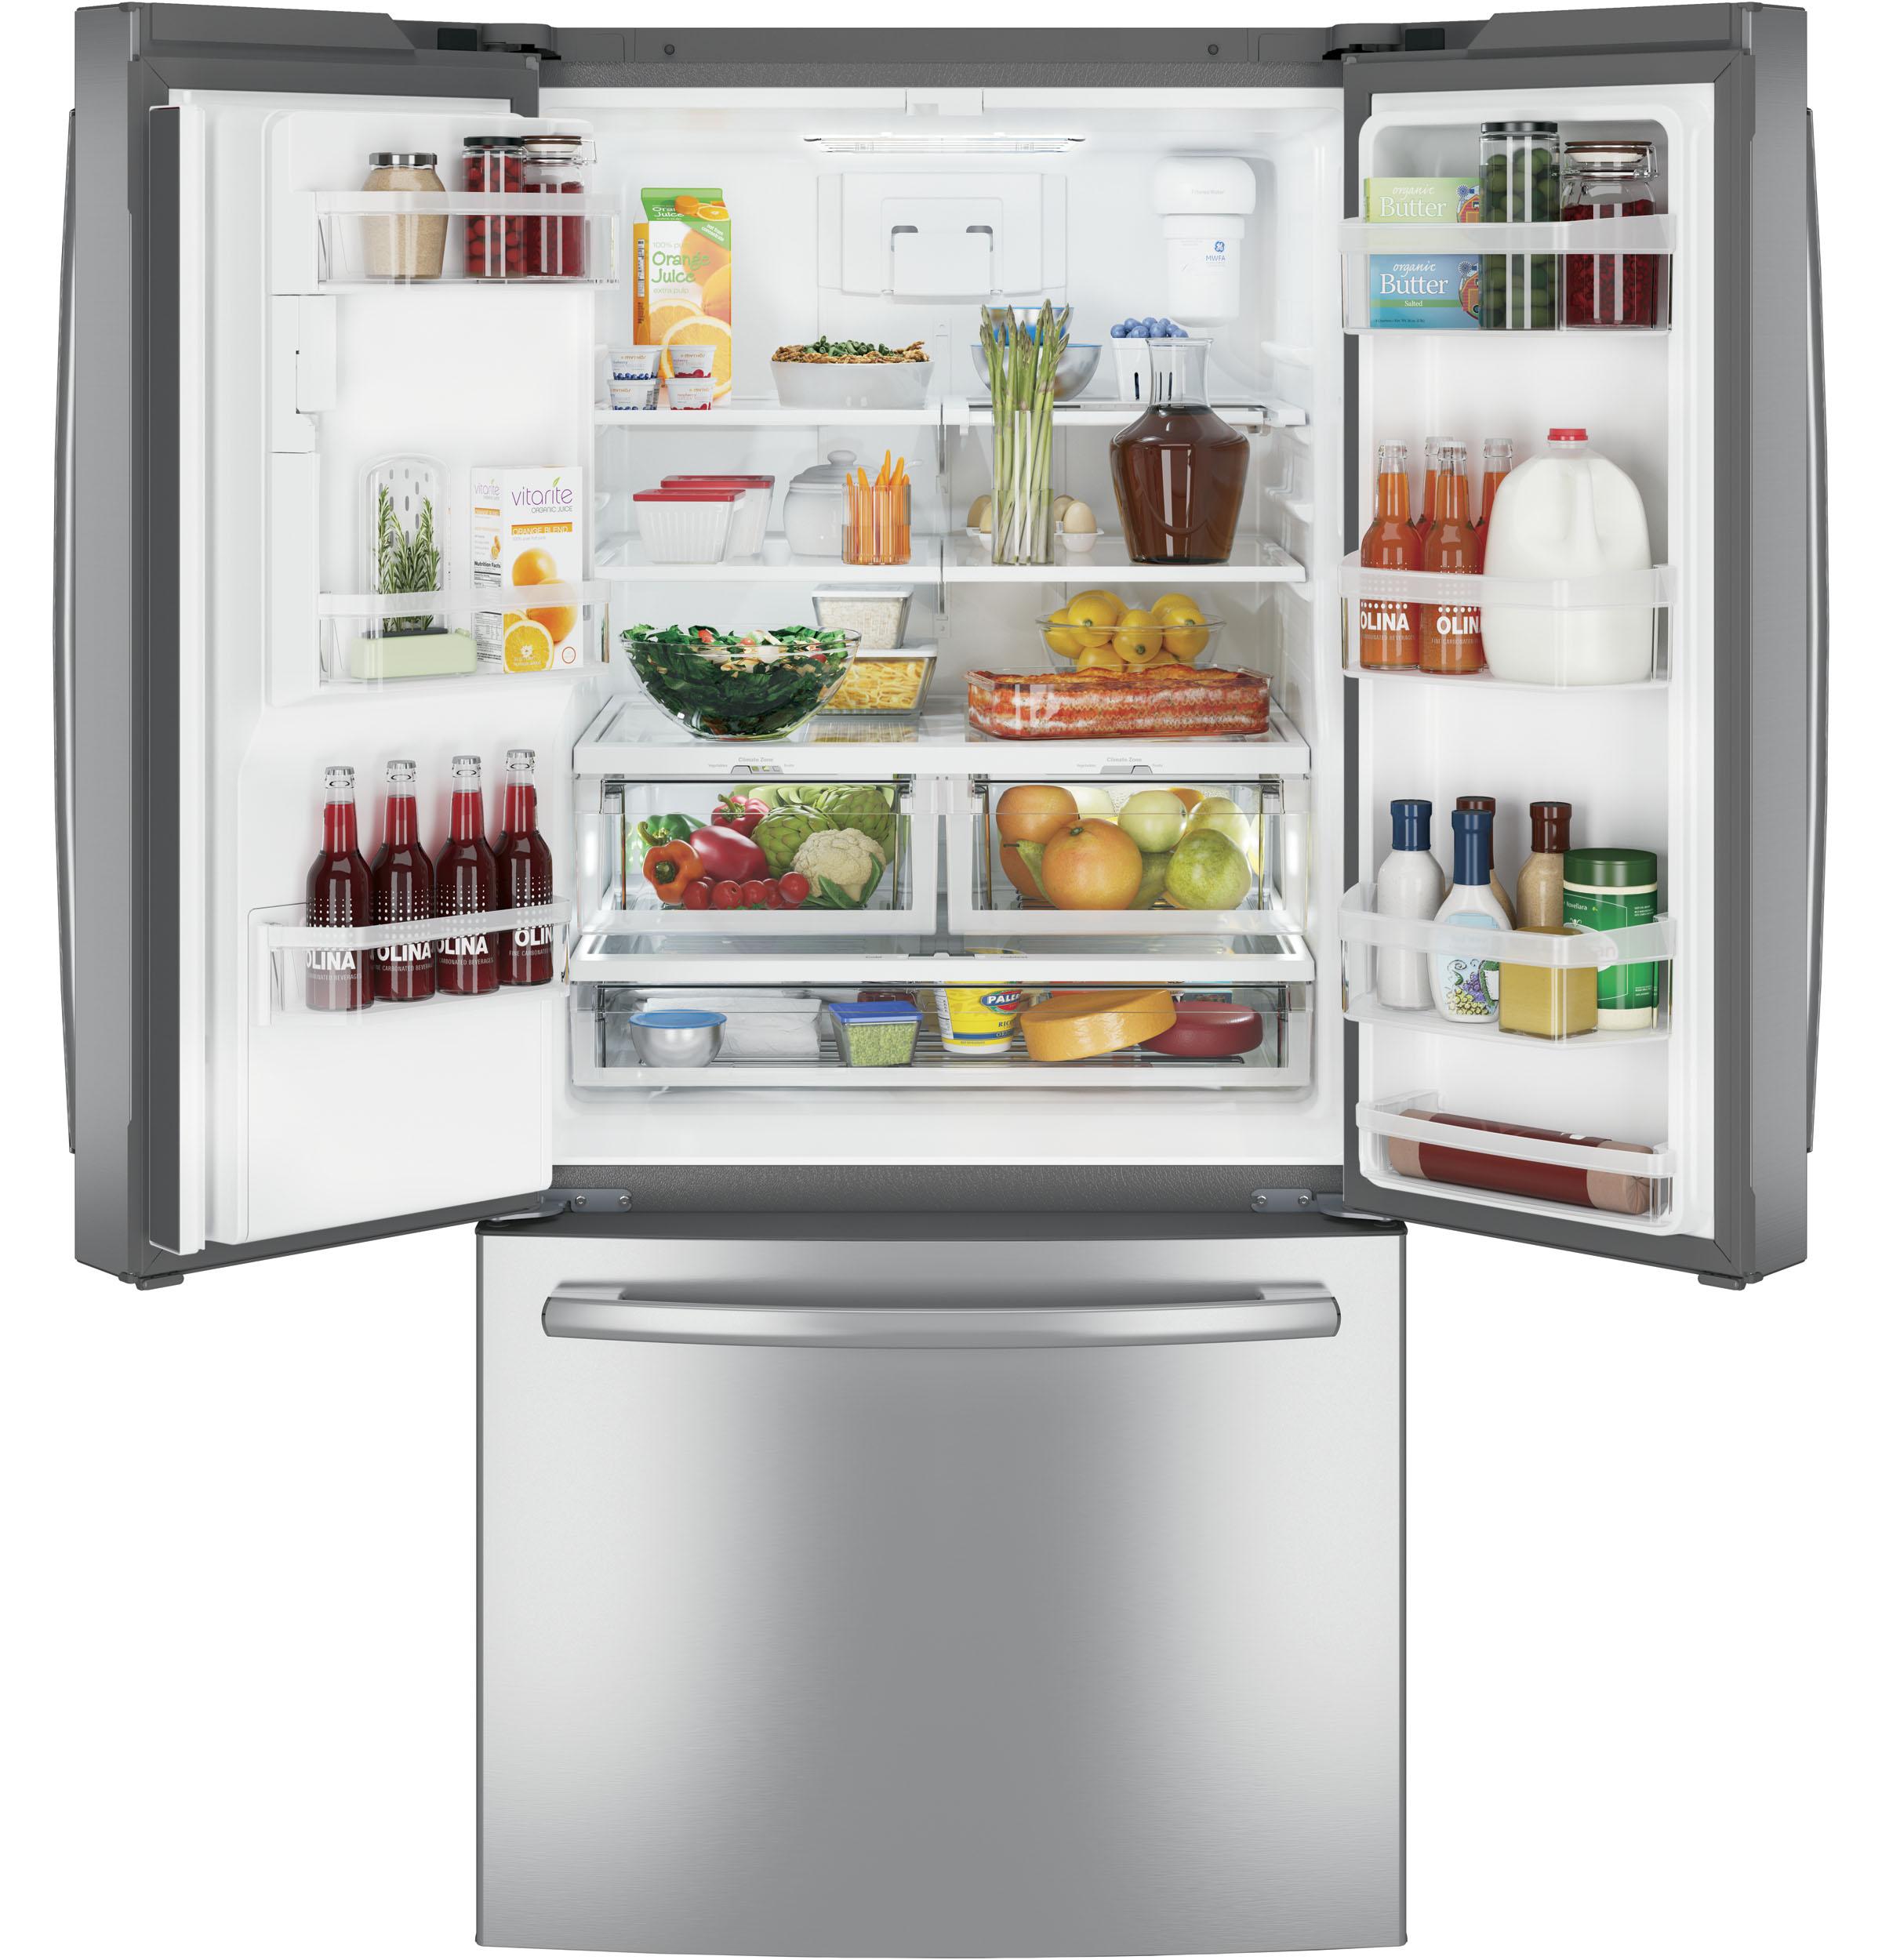 Model: GFE24JSKSS | GE® ENERGY STAR® 23.7 Cu. Ft. French-Door Refrigerator